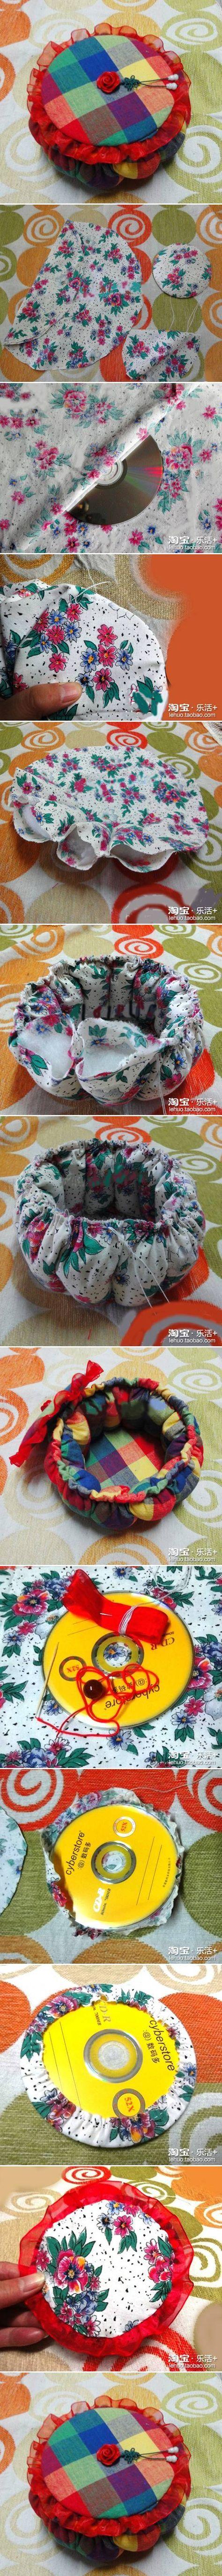 DIY Old CD Pumpkin Box